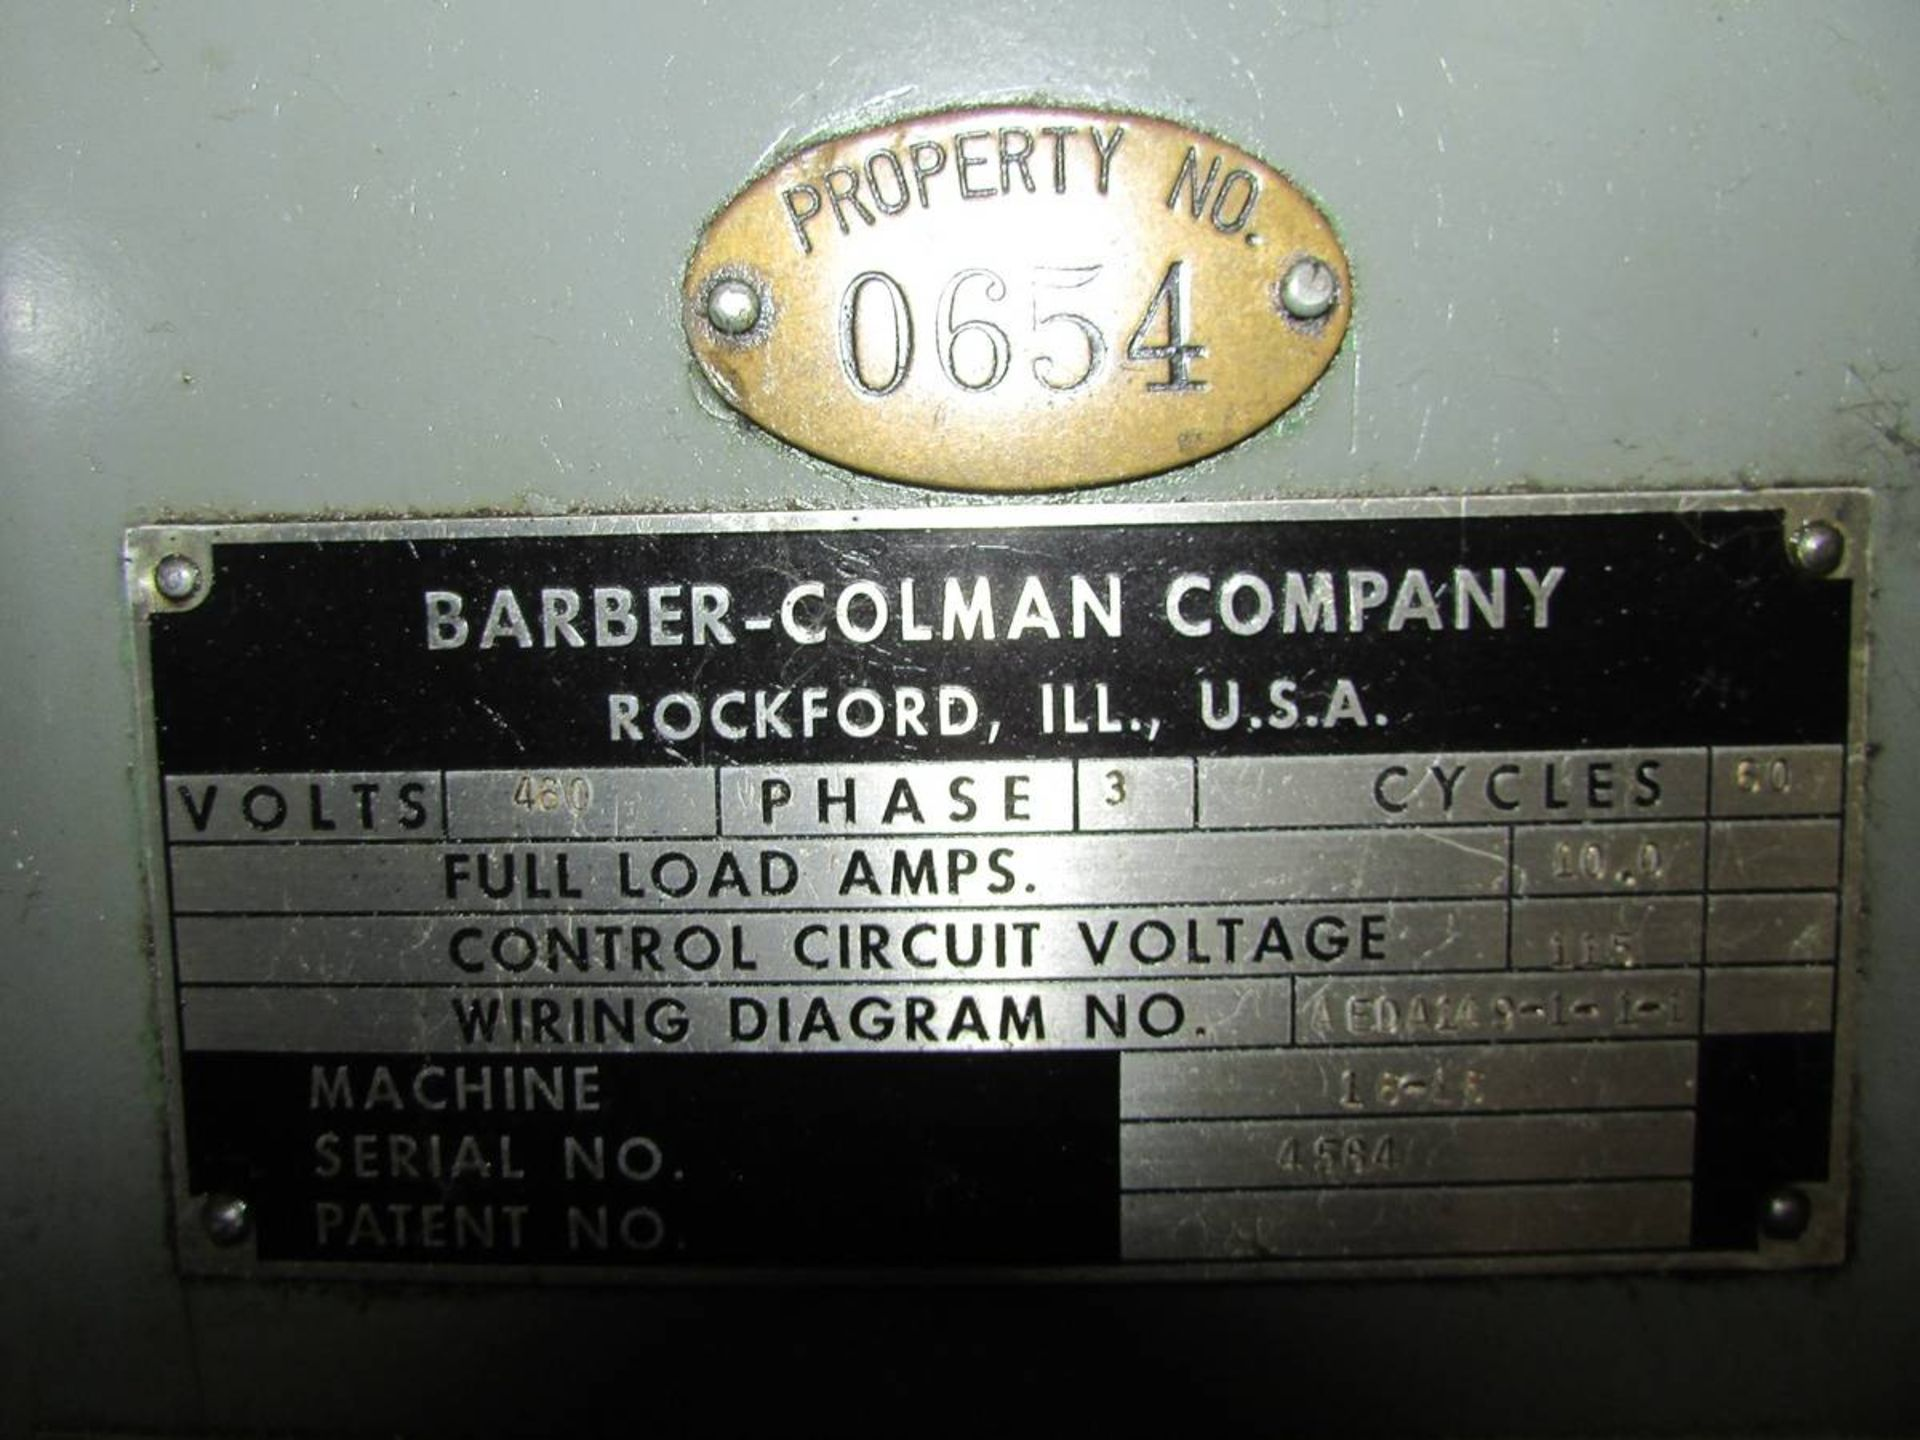 Barber Colman 16-16 Gear Hobbing Machine - Image 23 of 24